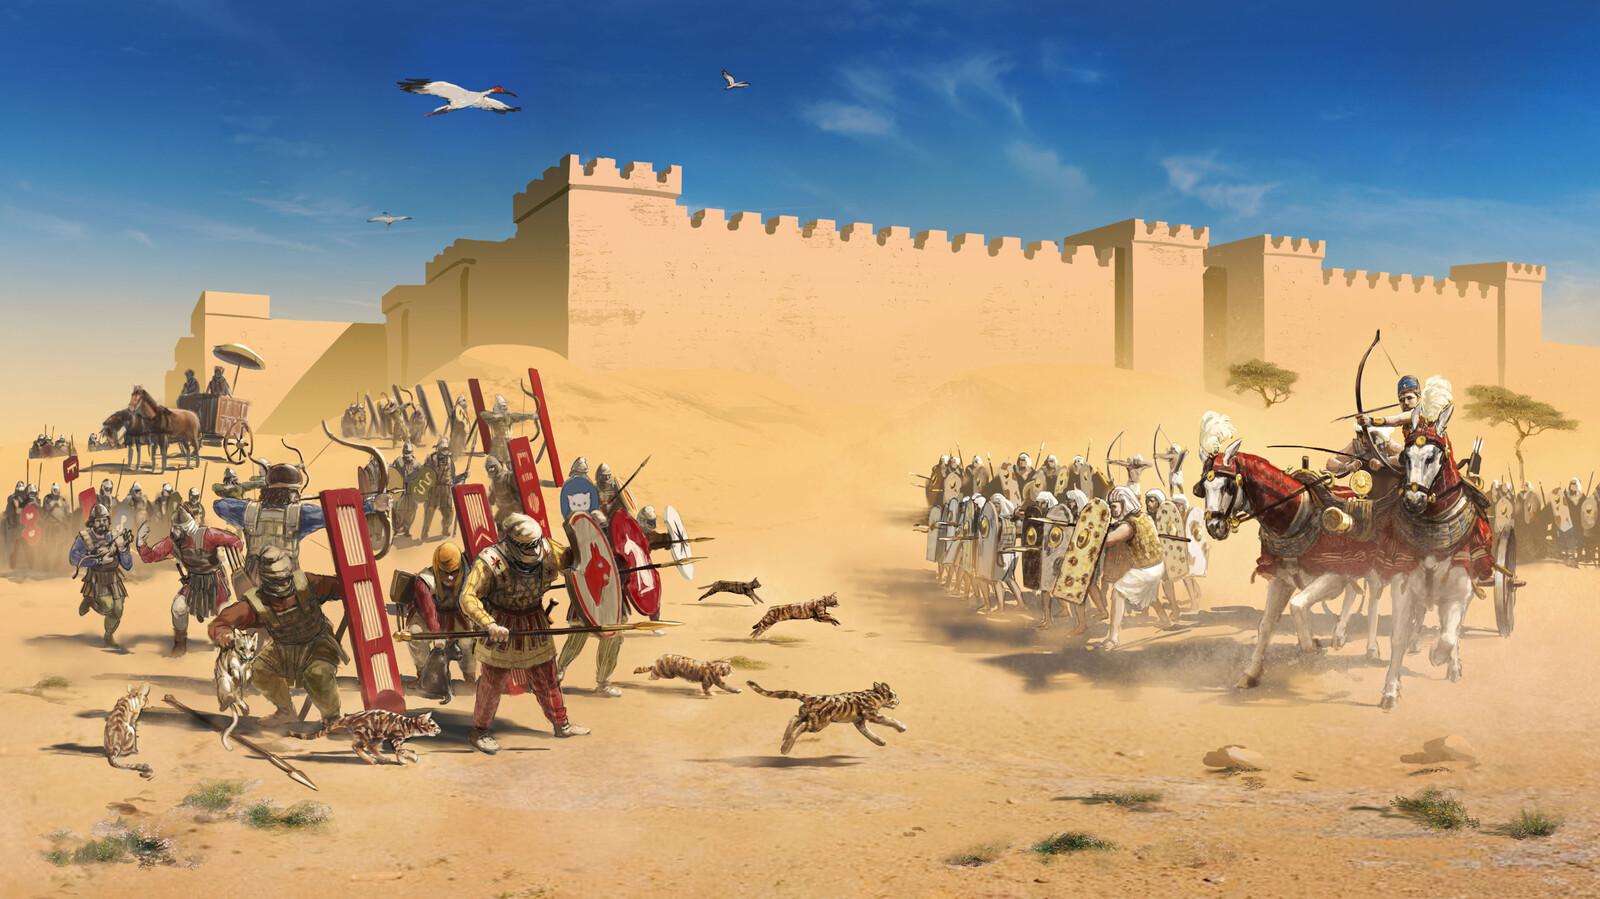 Battle of Pelusium, for World History Encyclopedia